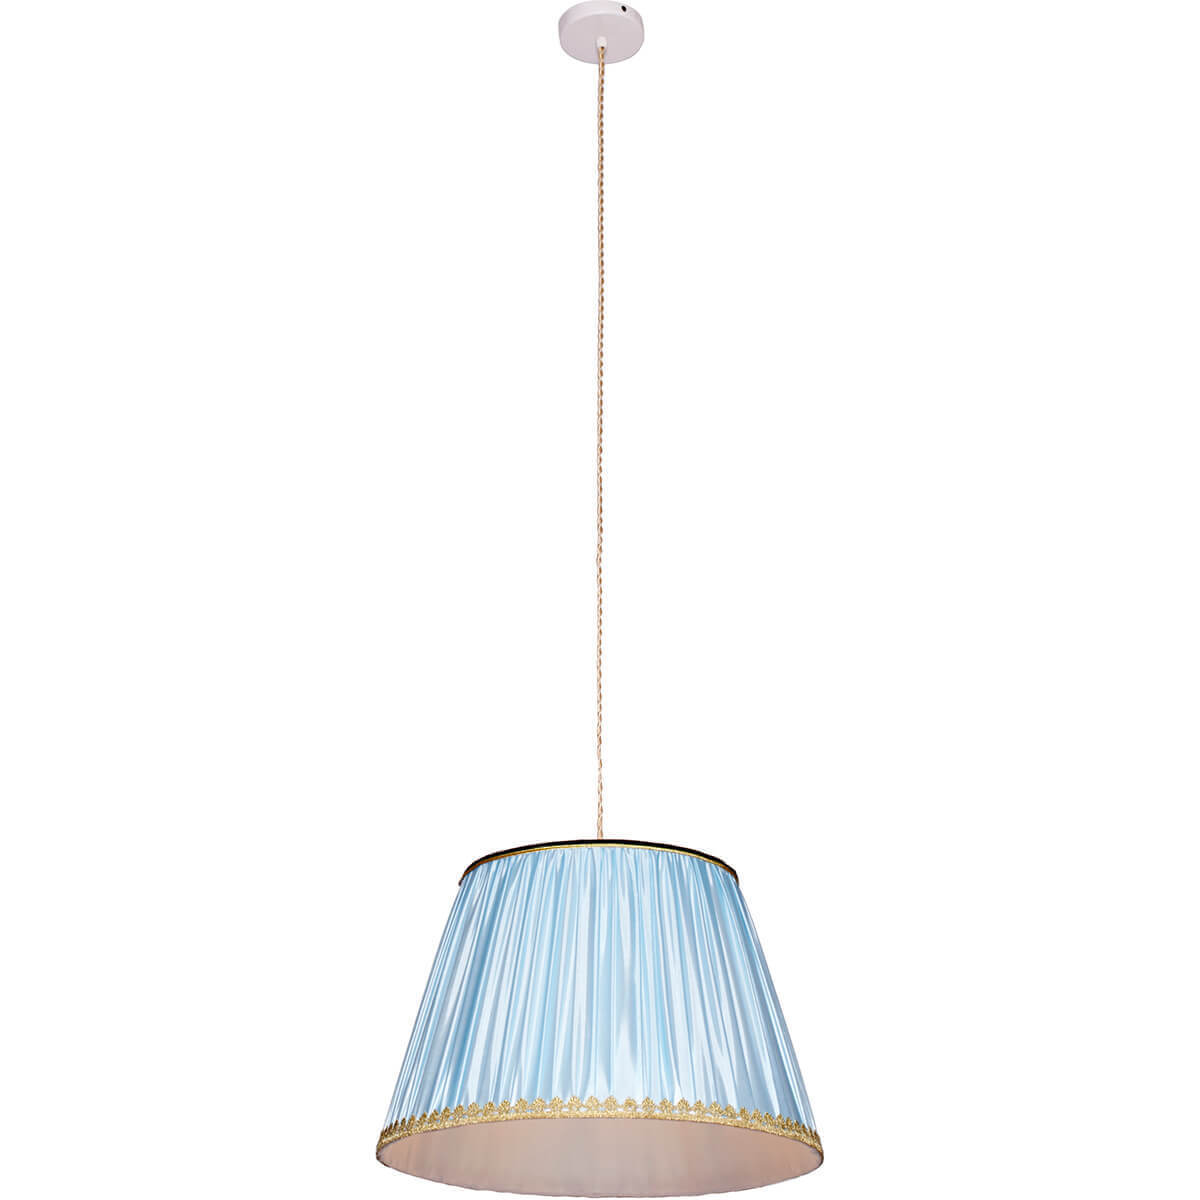 Подвесной светильник Lucia Tucci Lotte 214.1 цена